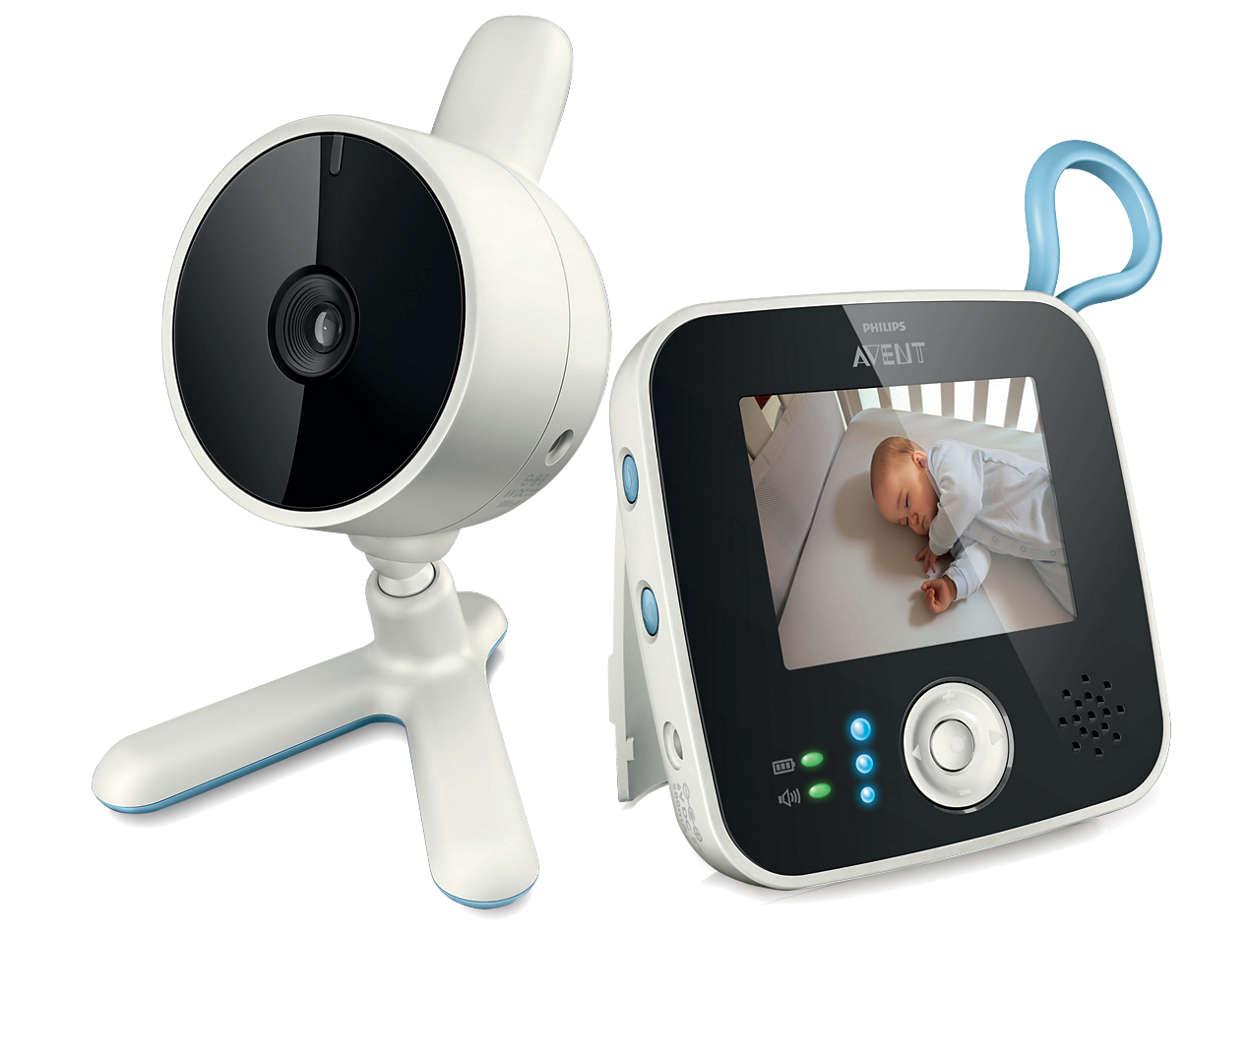 Avent Ψηφιακή Βρεφική Oθόνη Bίντεο (Μόνιτορ) μητέρα παιδί   αξεσουάρ και παιχνίδια   ενδοεπικοινωνία   αποστειρωτές